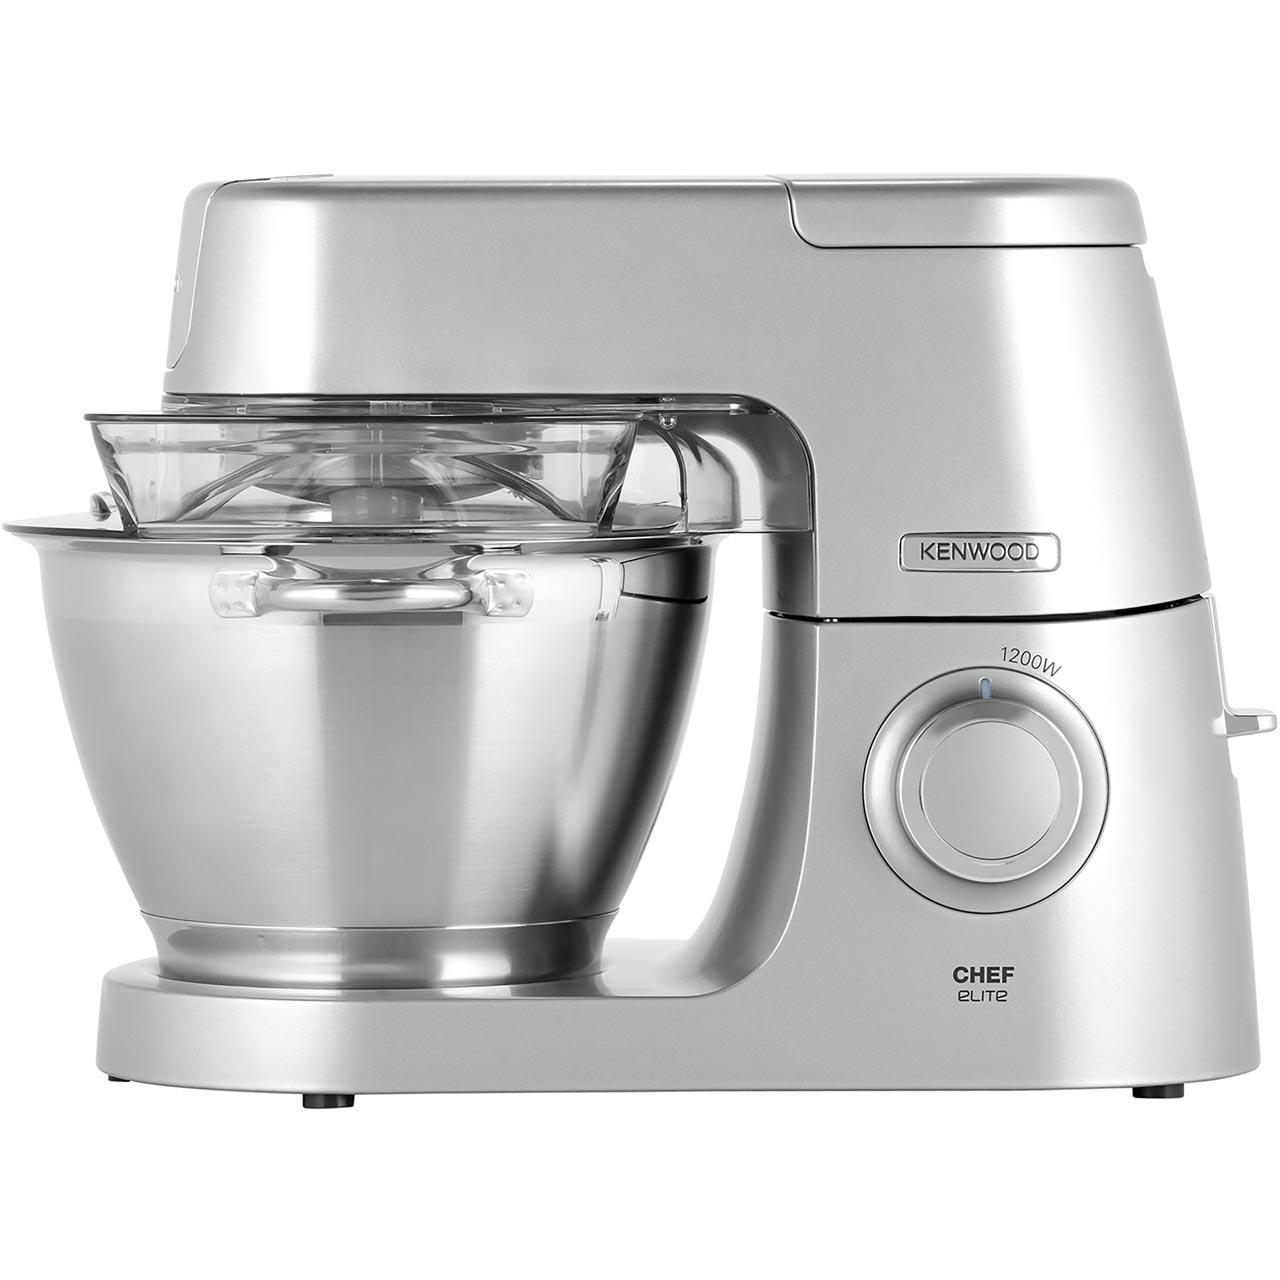 Kenwood Chef Elite KVC5100S Kitchen Machine - Silver